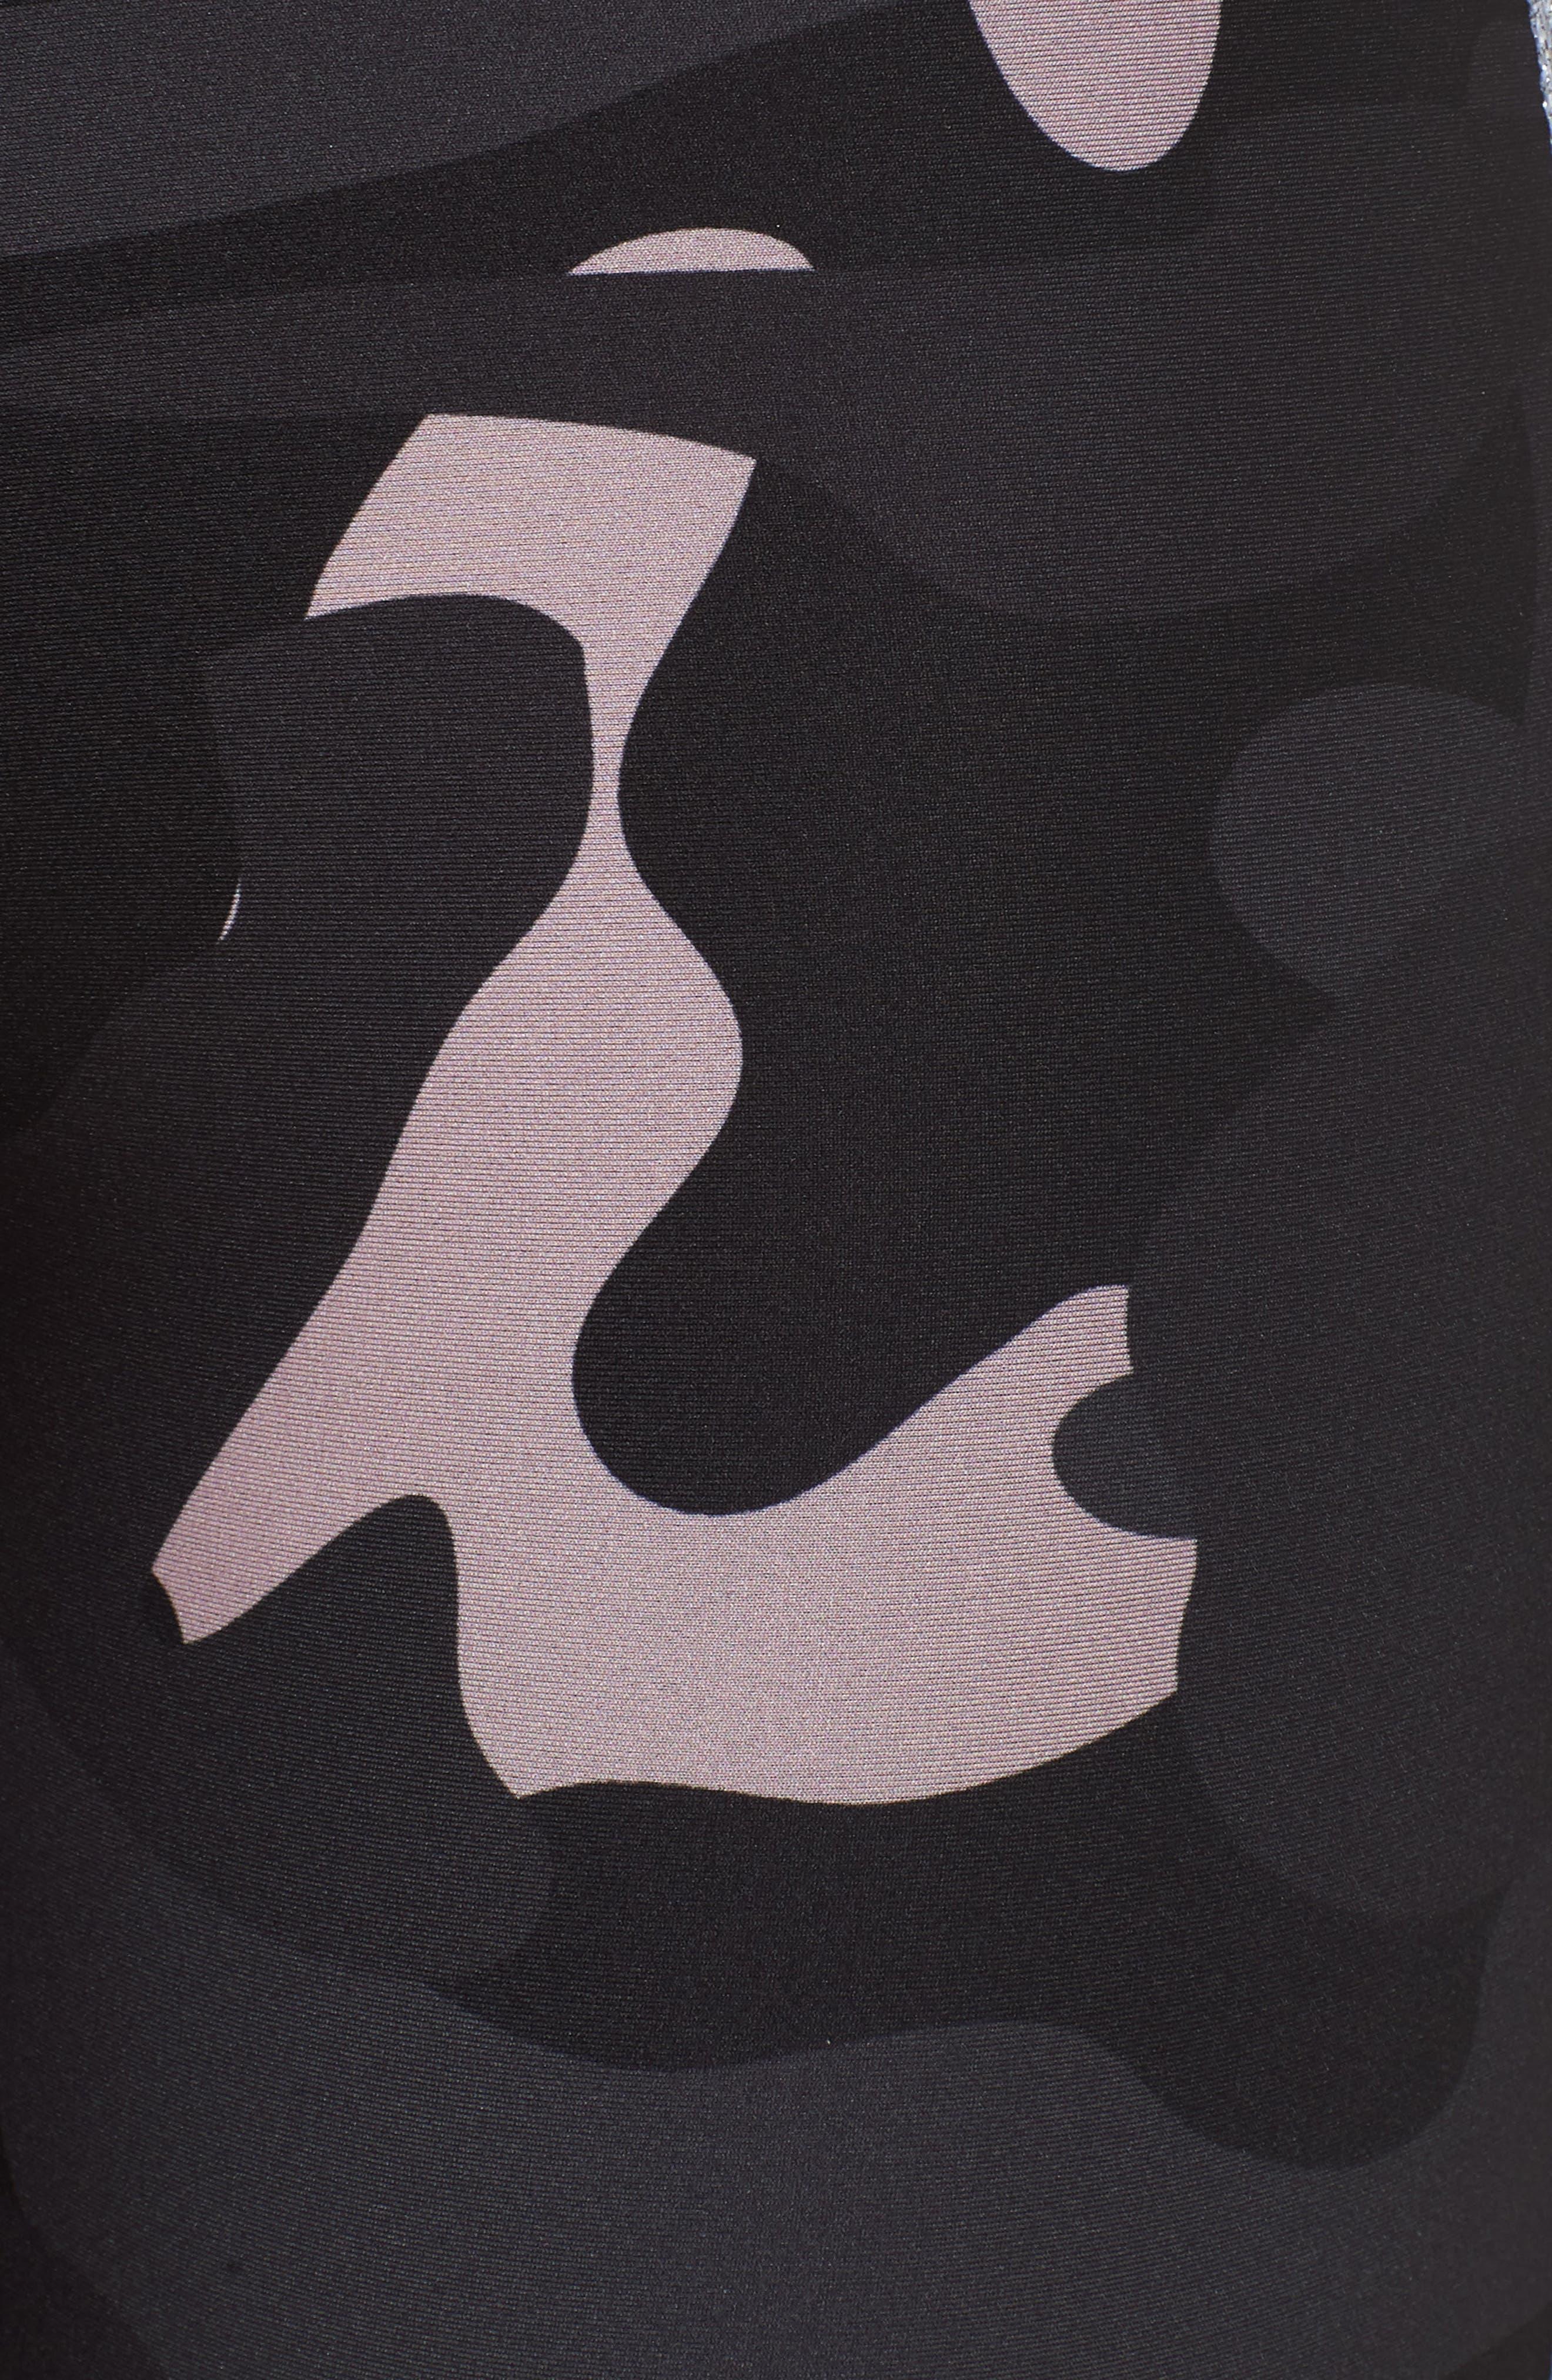 Ultra Camo Collegiate Leggings,                             Alternate thumbnail 6, color,                             Blush/ Silver